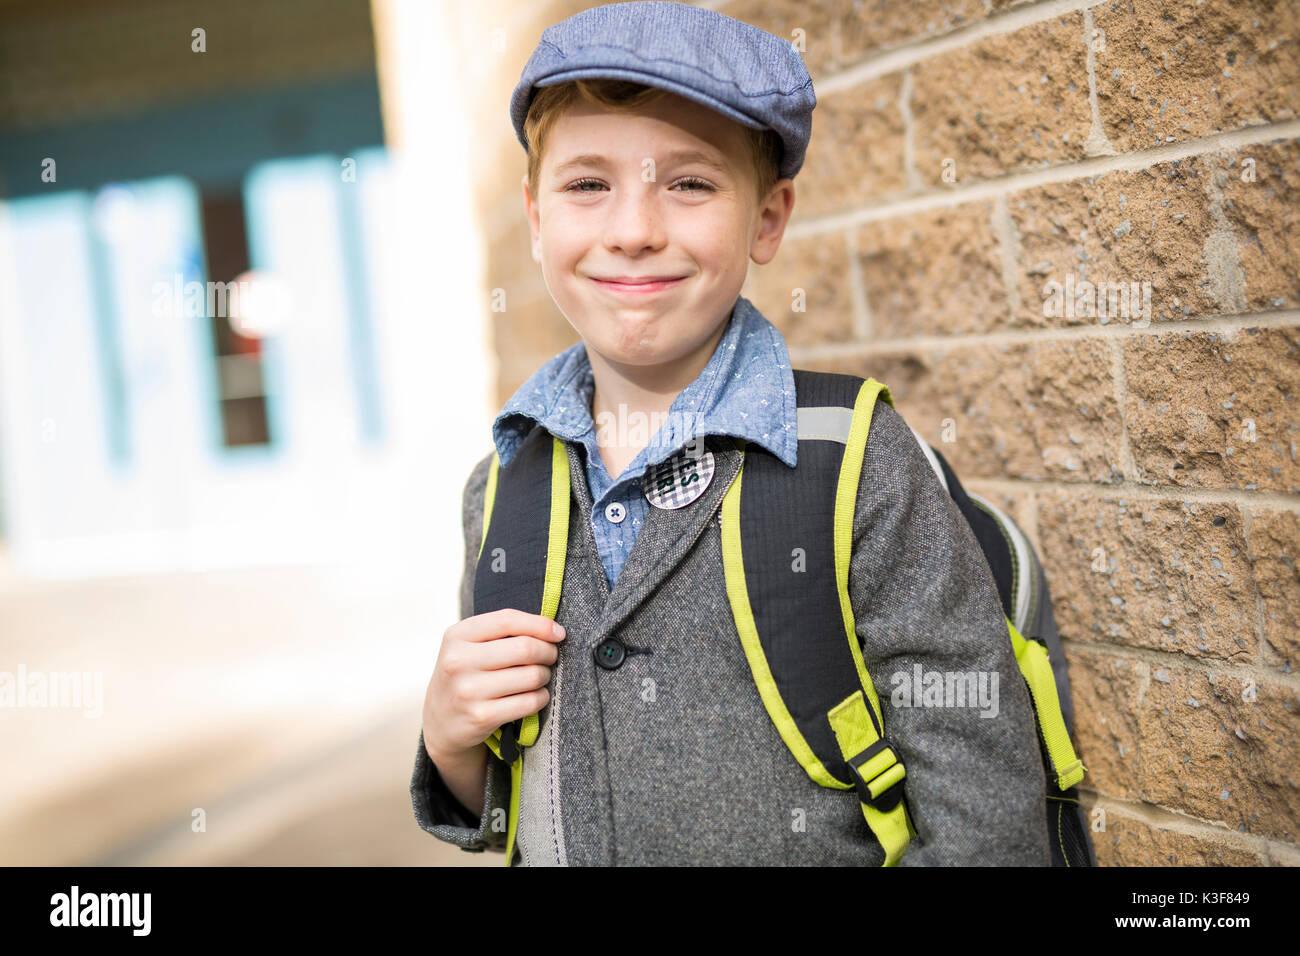 Pre teen boy at school - Stock Image